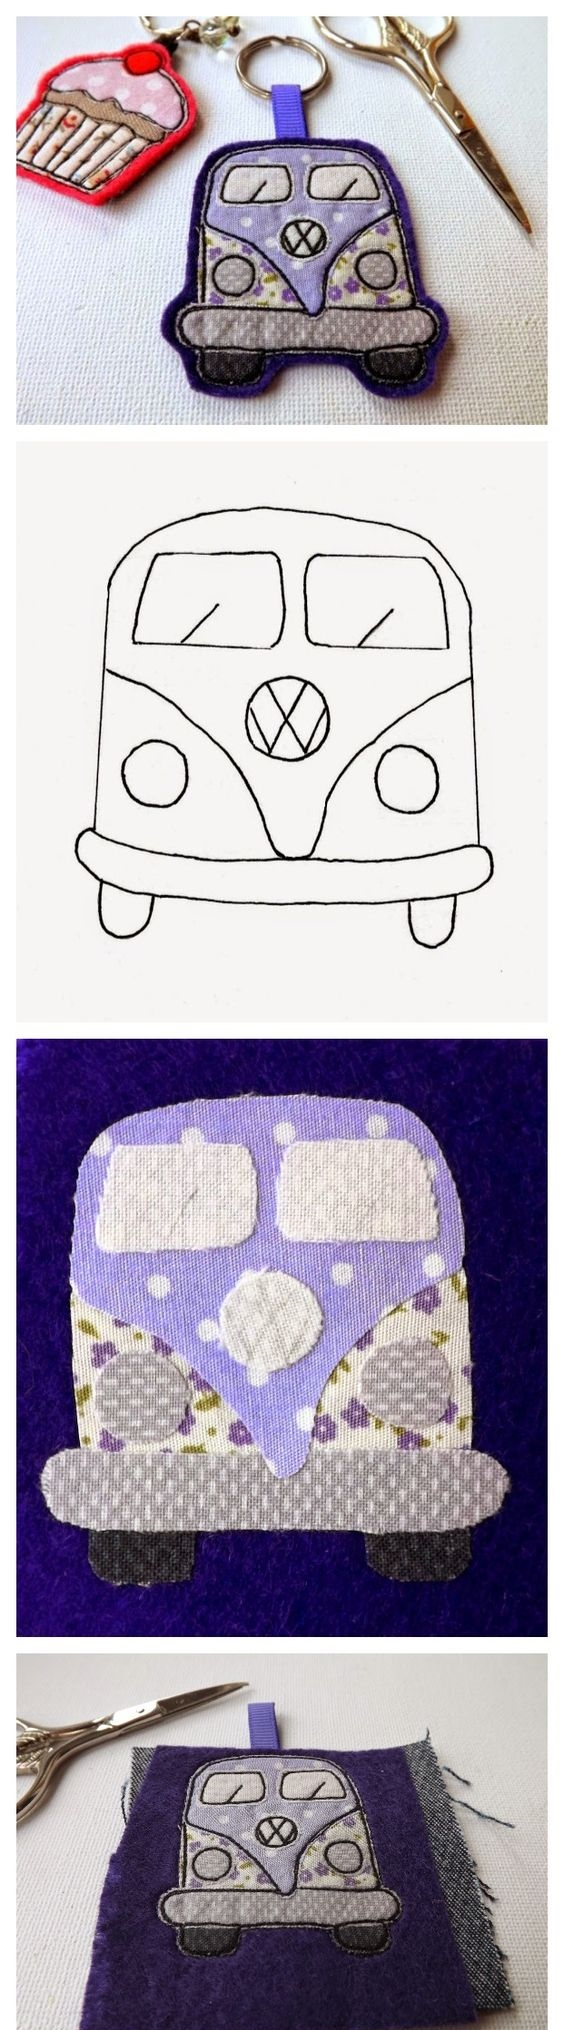 Llavero de fieltro, furgoneta Volskwagen Vanette con patrón